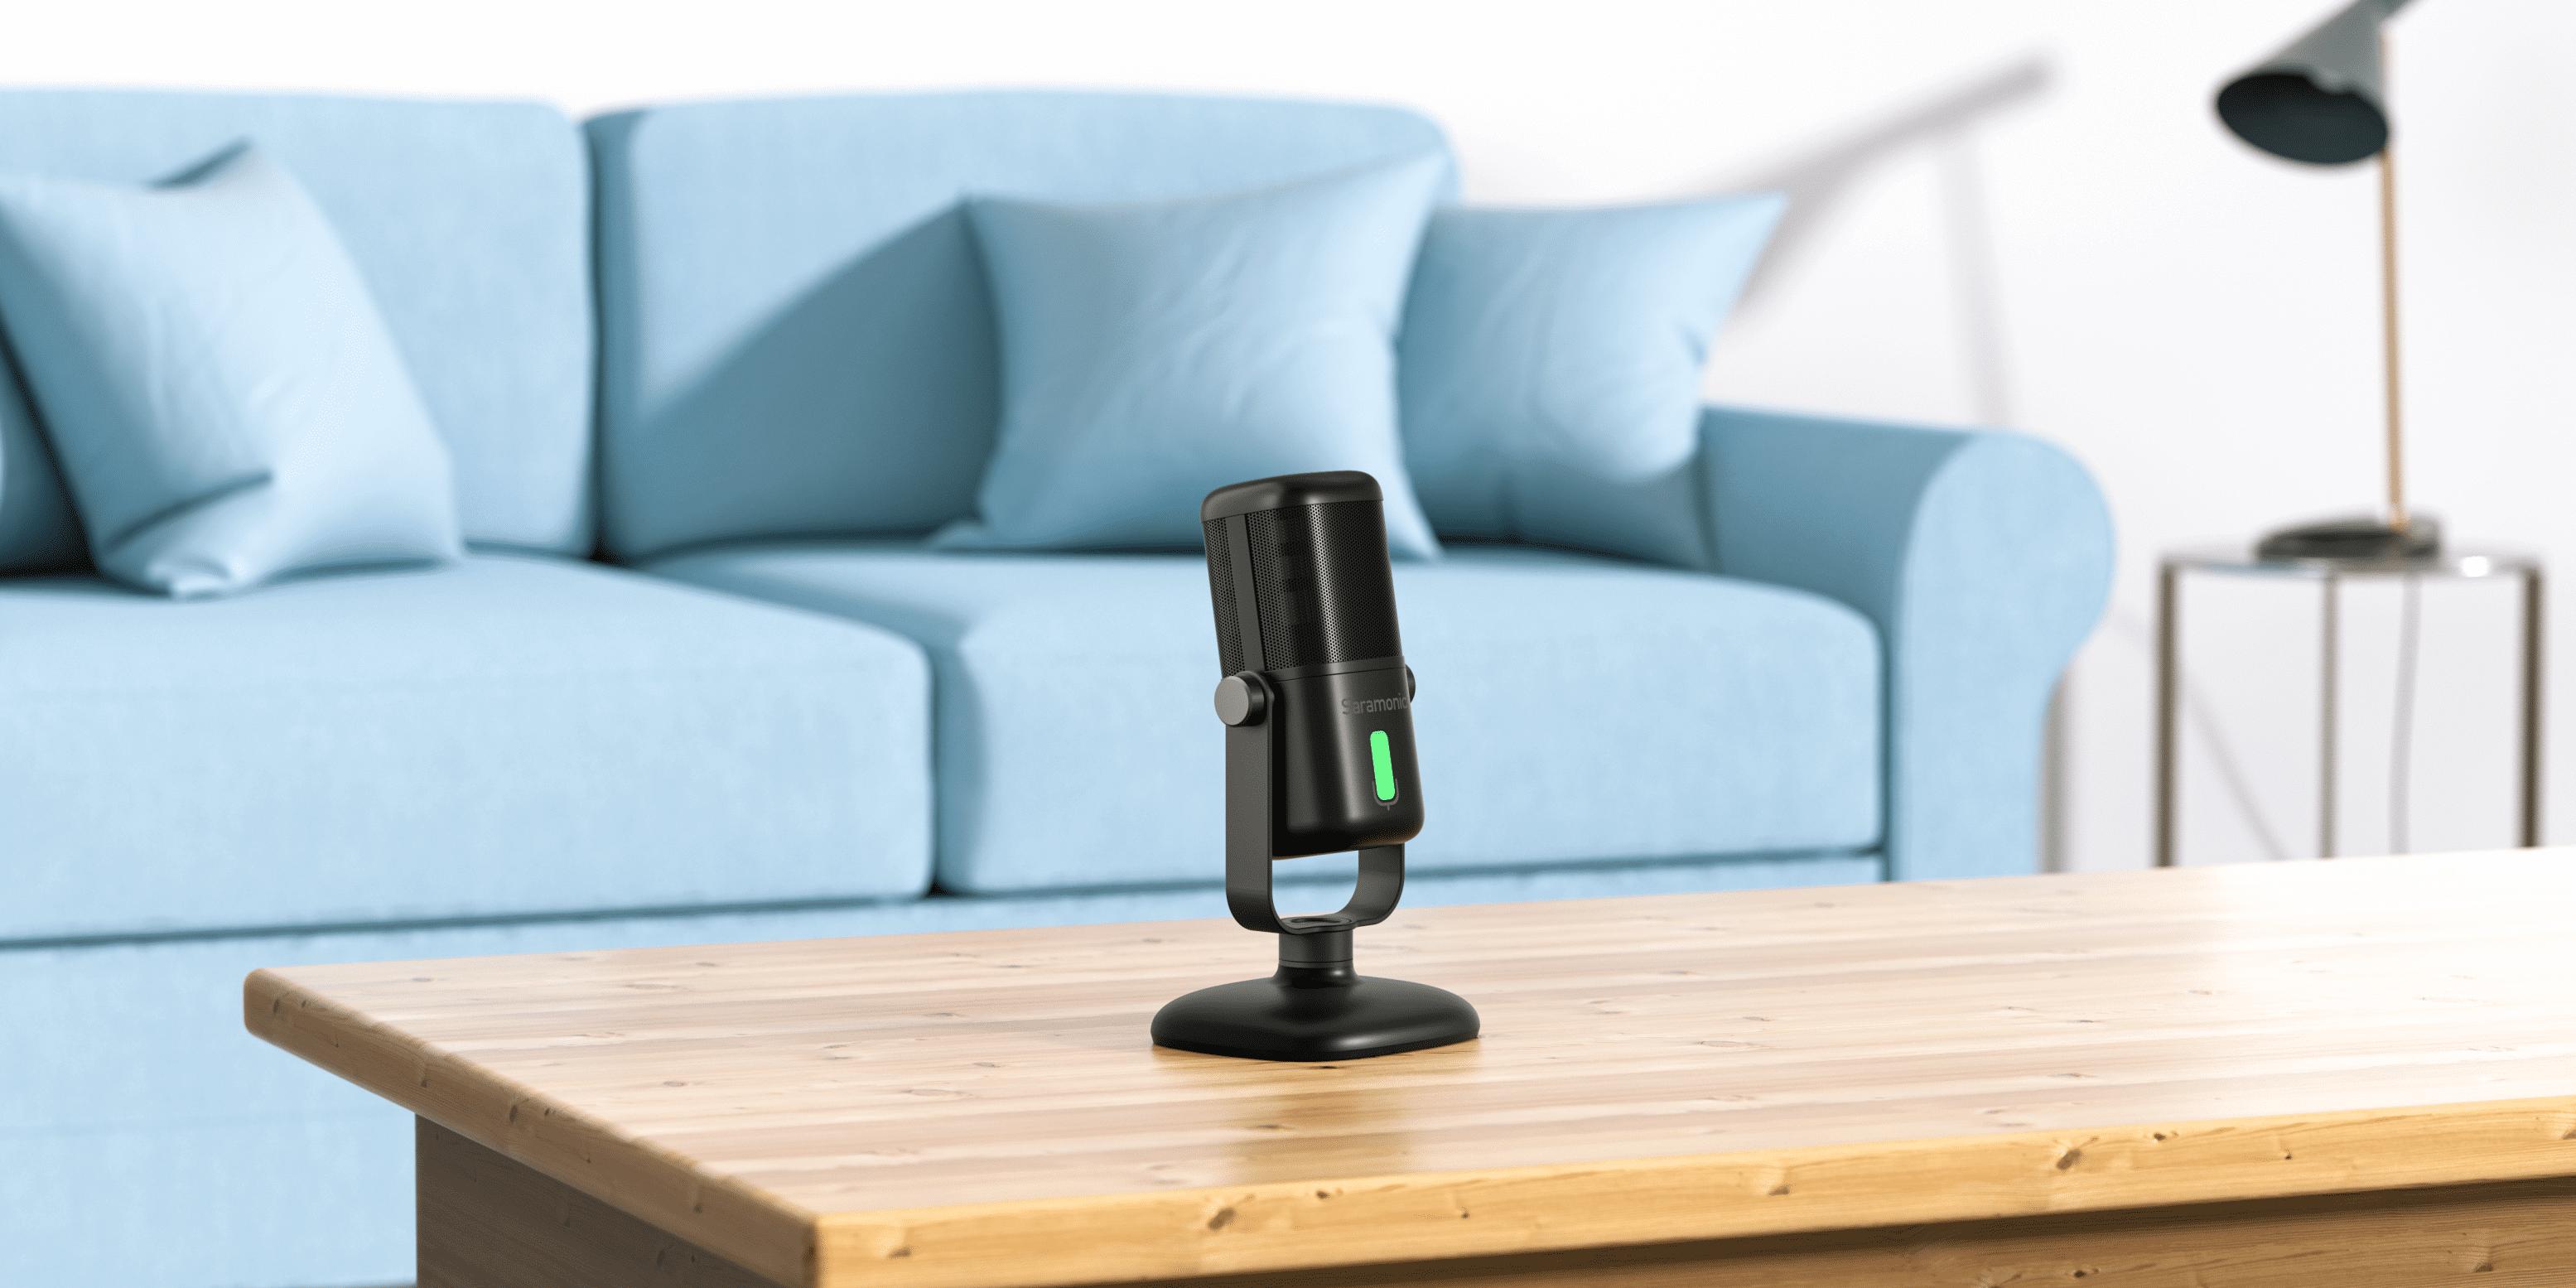 Saramonic SR-MV2000 Compact and Professional USB Microphone